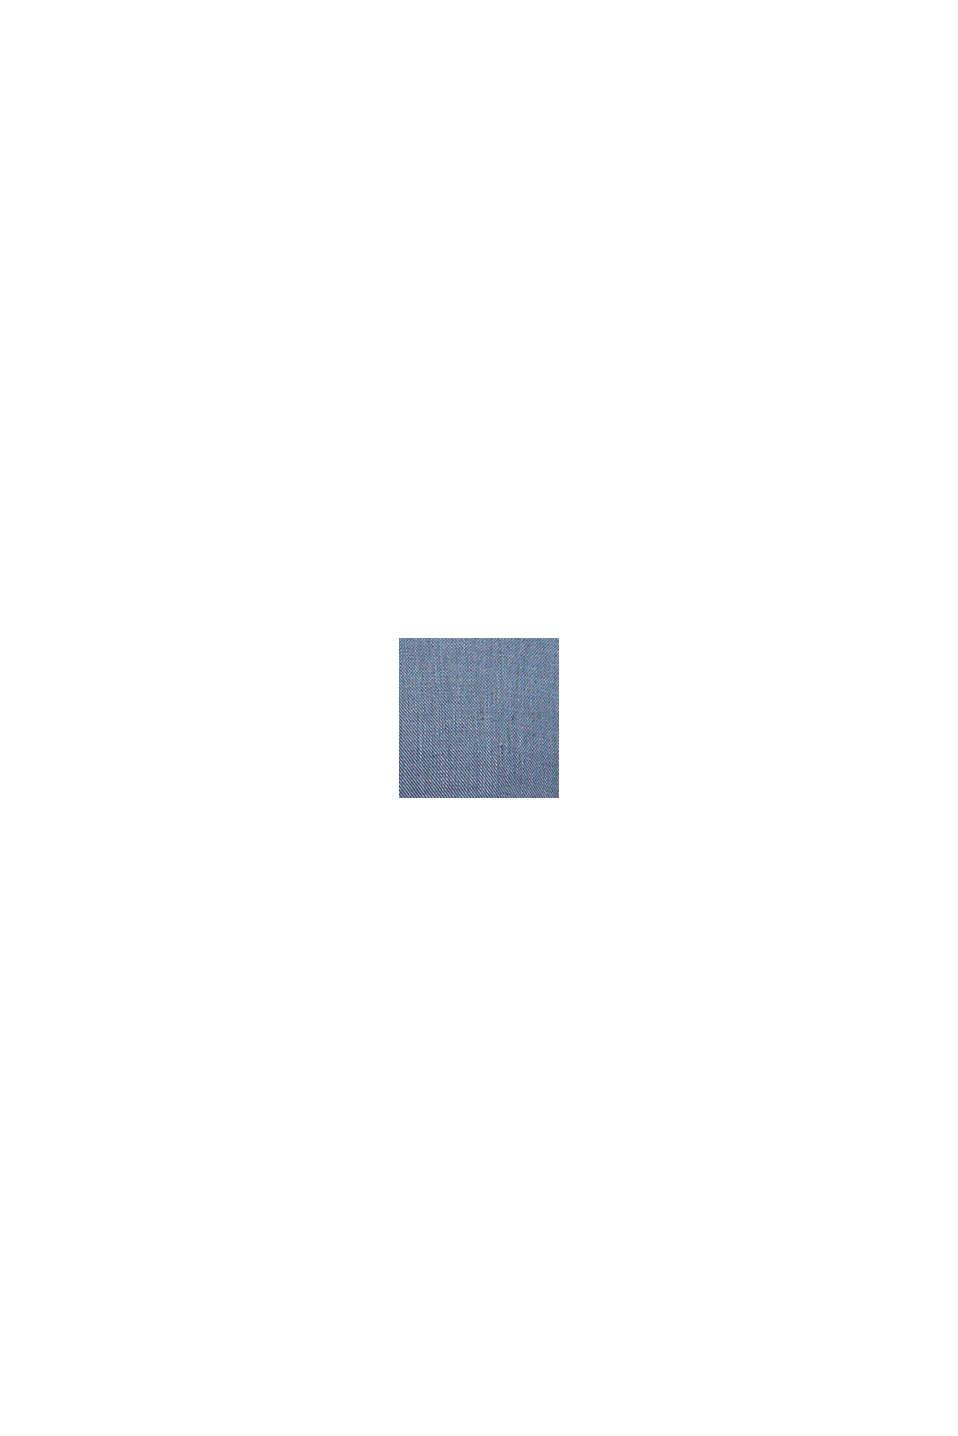 FIL-A-FIL Aus Leinen-Mix: Weste, BLUE, swatch